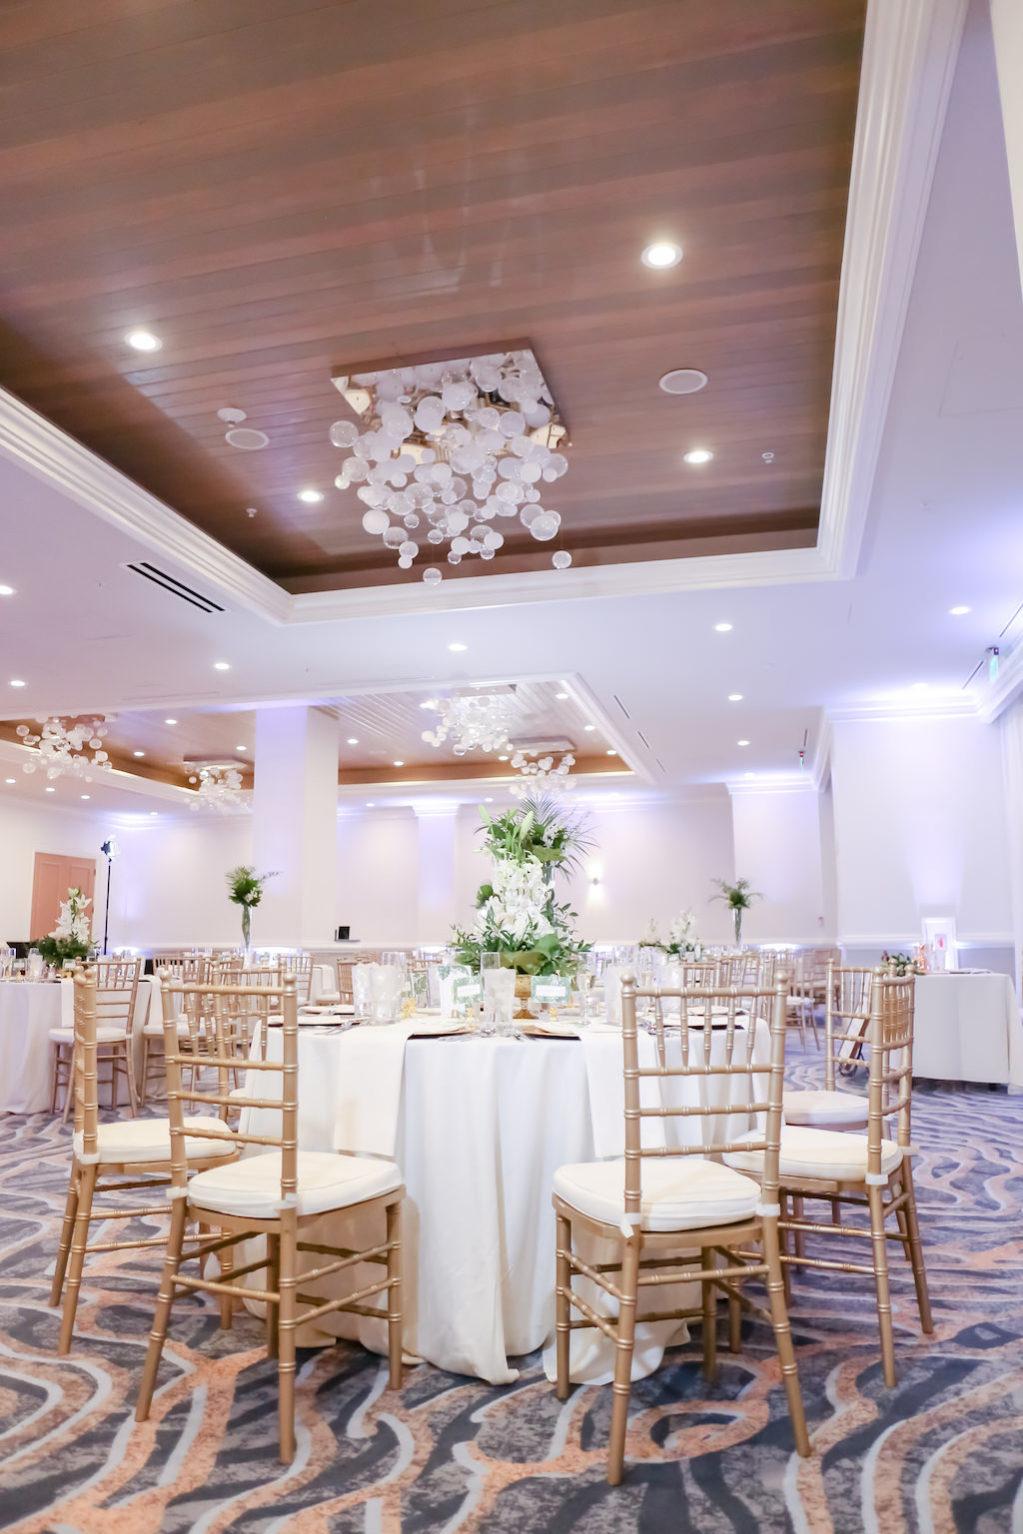 Florida Ballroom Tropical Elegance Wedding Reception Decor, Round Tables with White Linens, Gold Chiavari Chairs | Tampa Bay Wedding Photographer Lifelong Photography Studios | Hotel Waterfront Wedding Venue Hyatt Regency Clearwater Beach